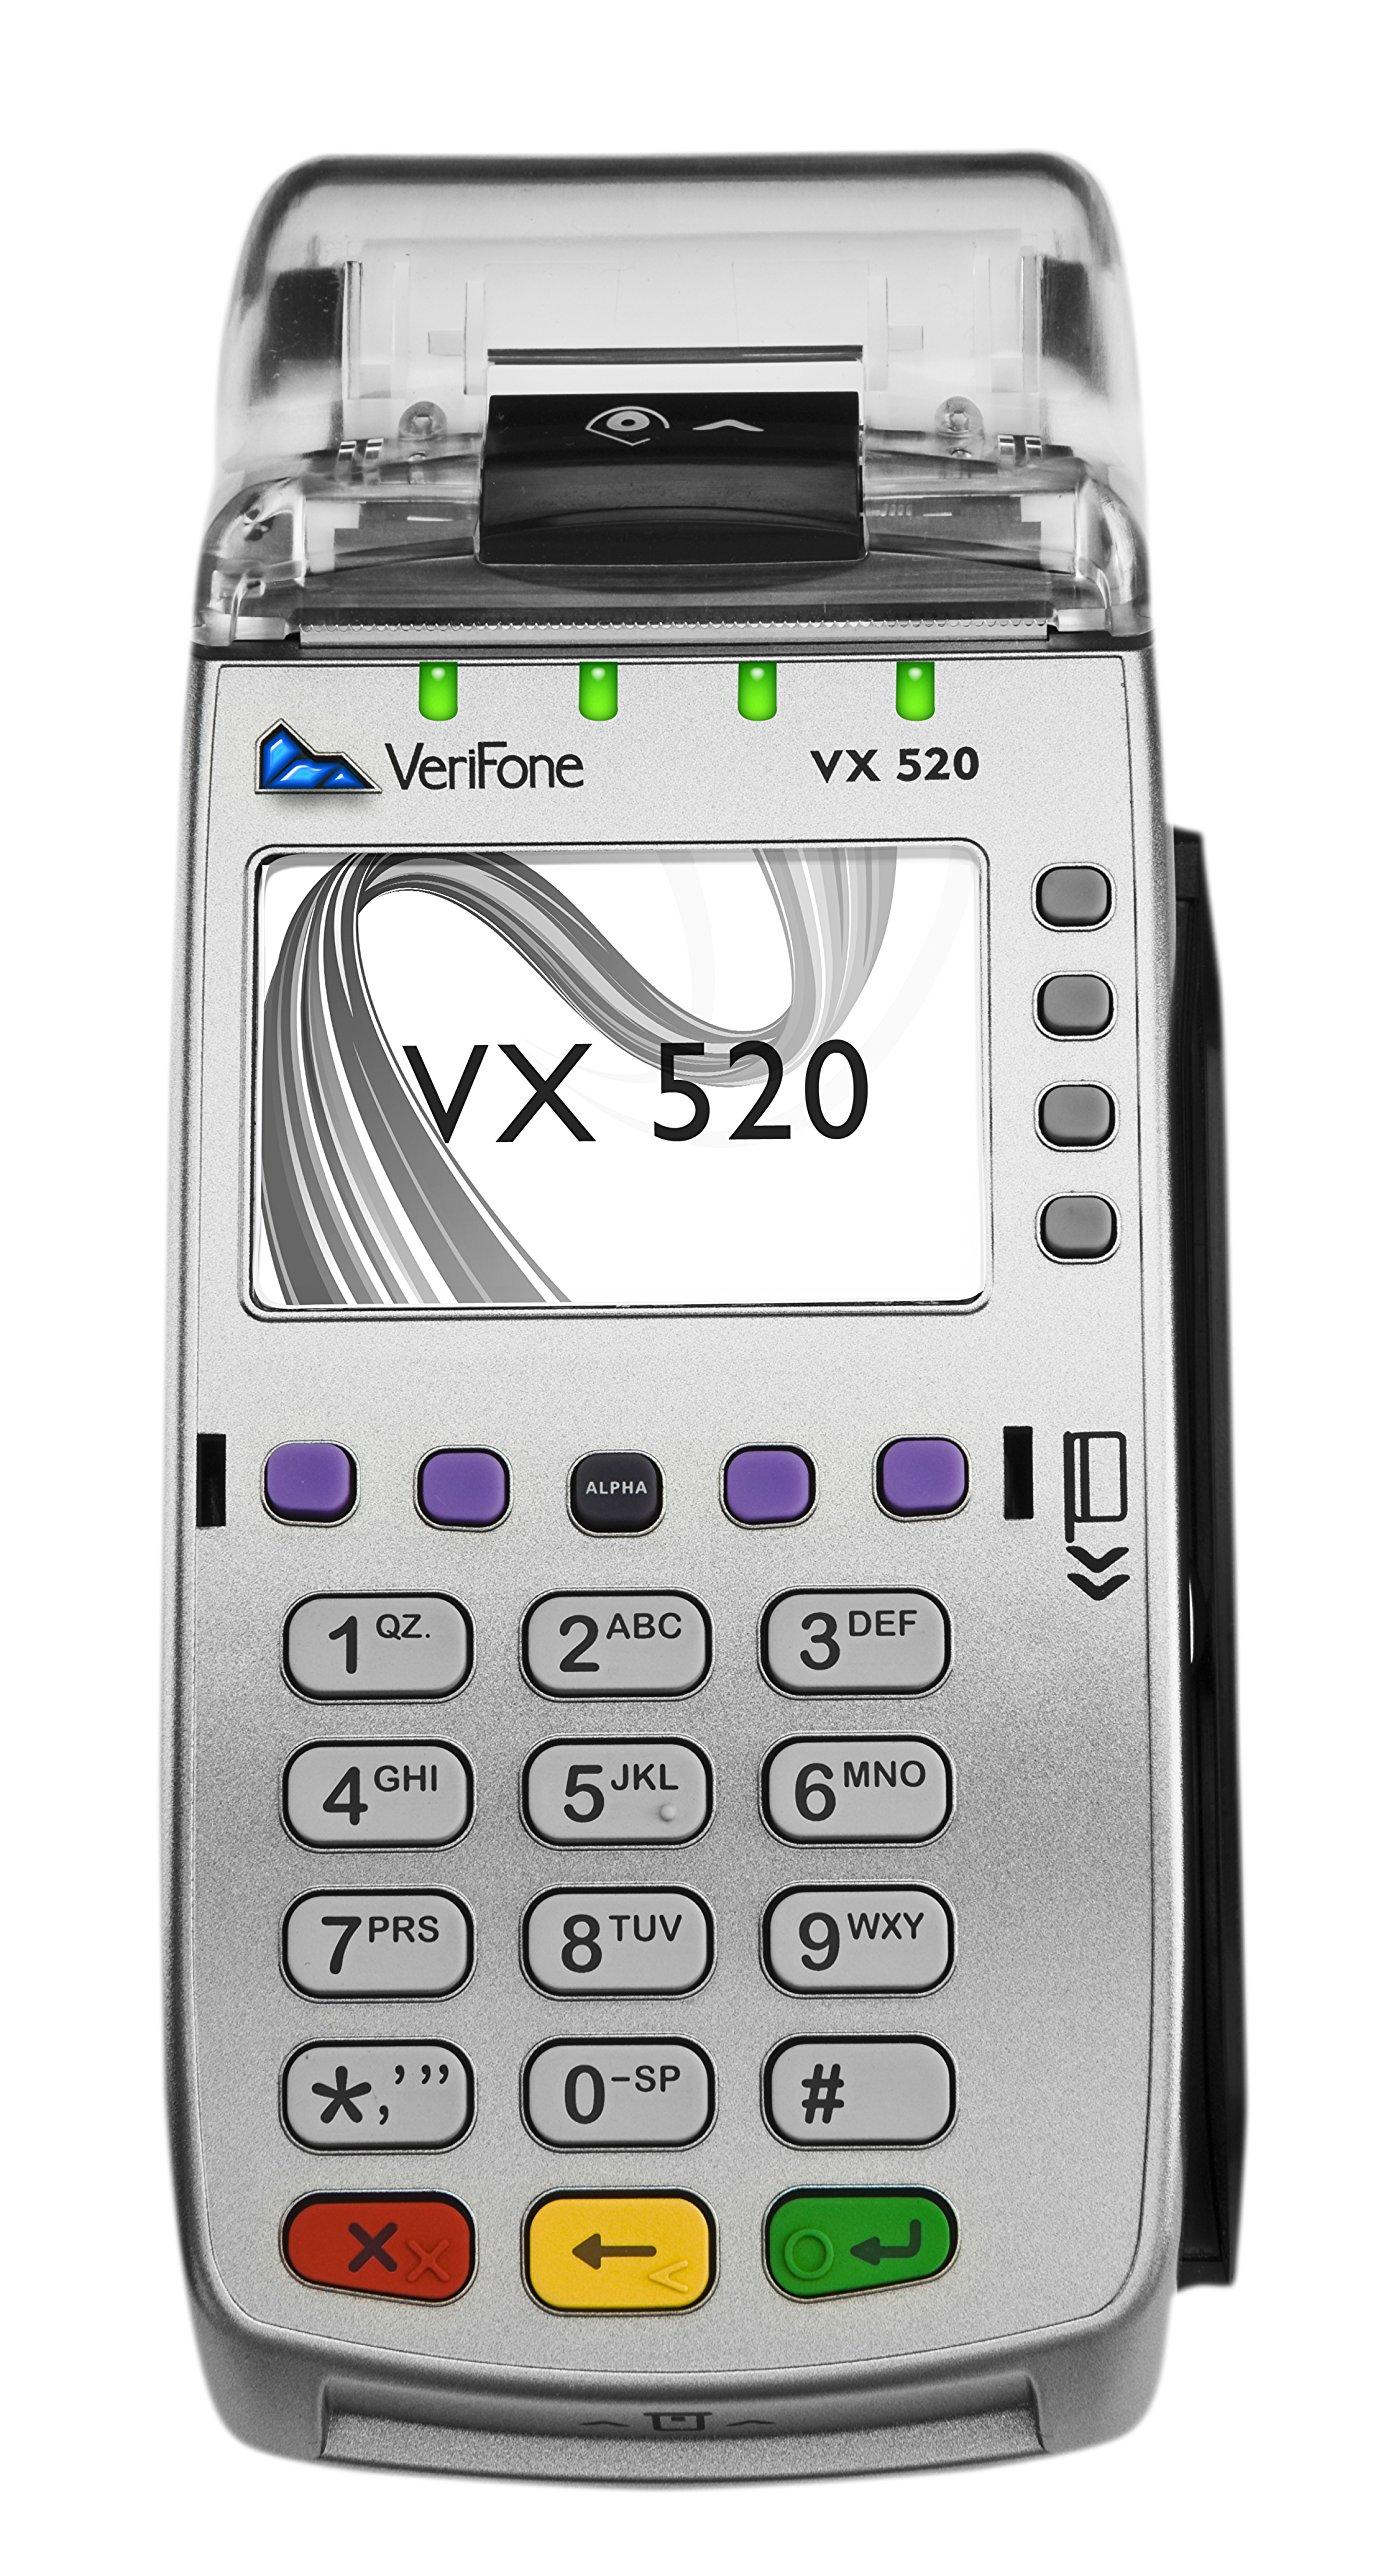 VeriFone Refurbished Vx520 EMV CLTS 64MB Credit Card Terminal